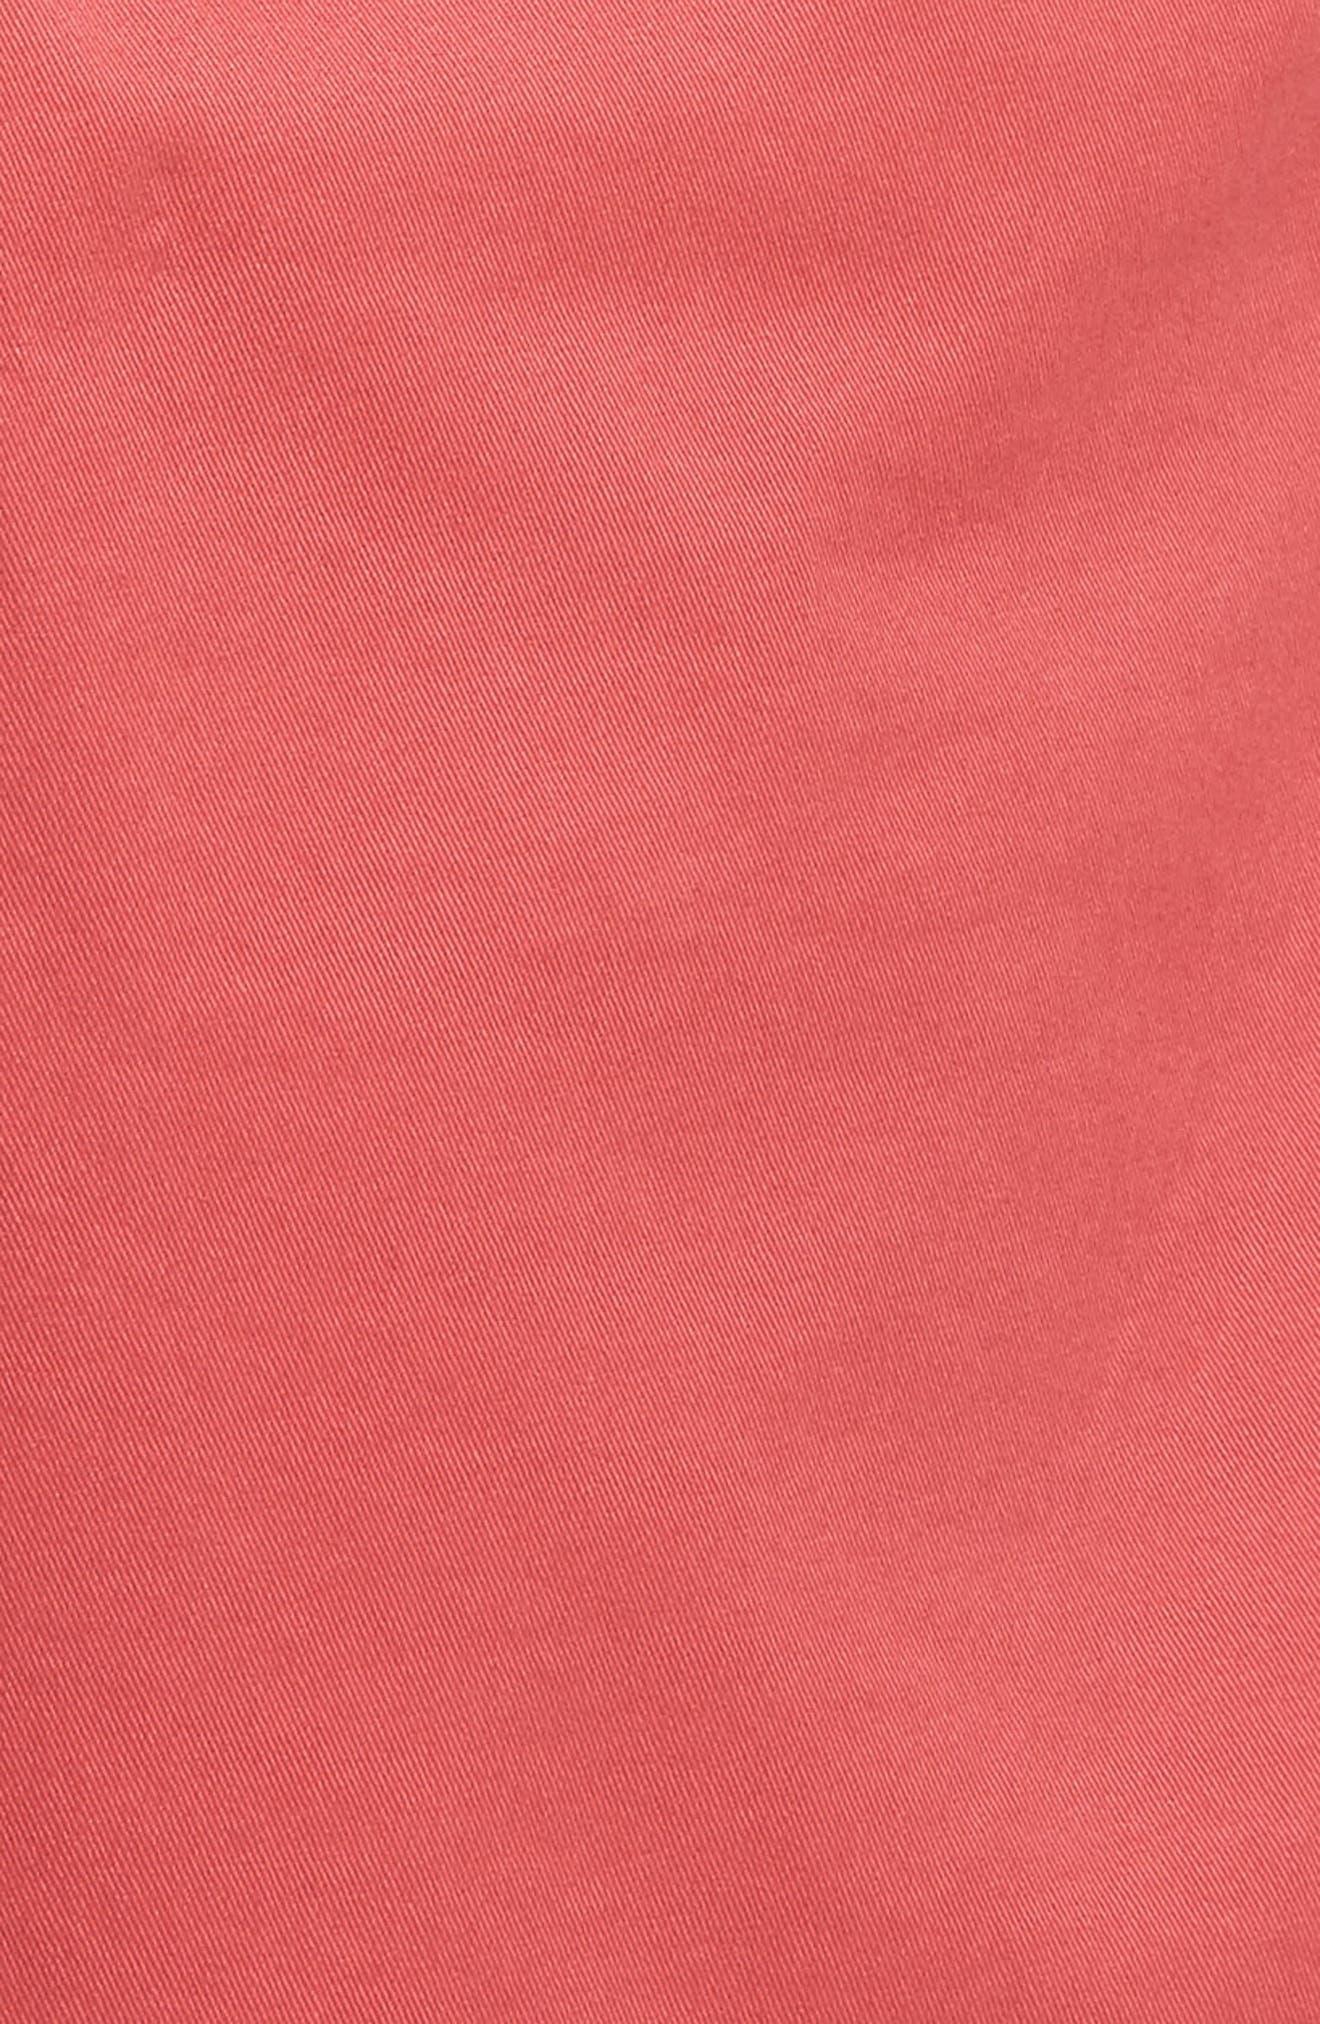 Ballard Slim Fit Stretch Chino 9-Inch Shorts,                             Alternate thumbnail 59, color,